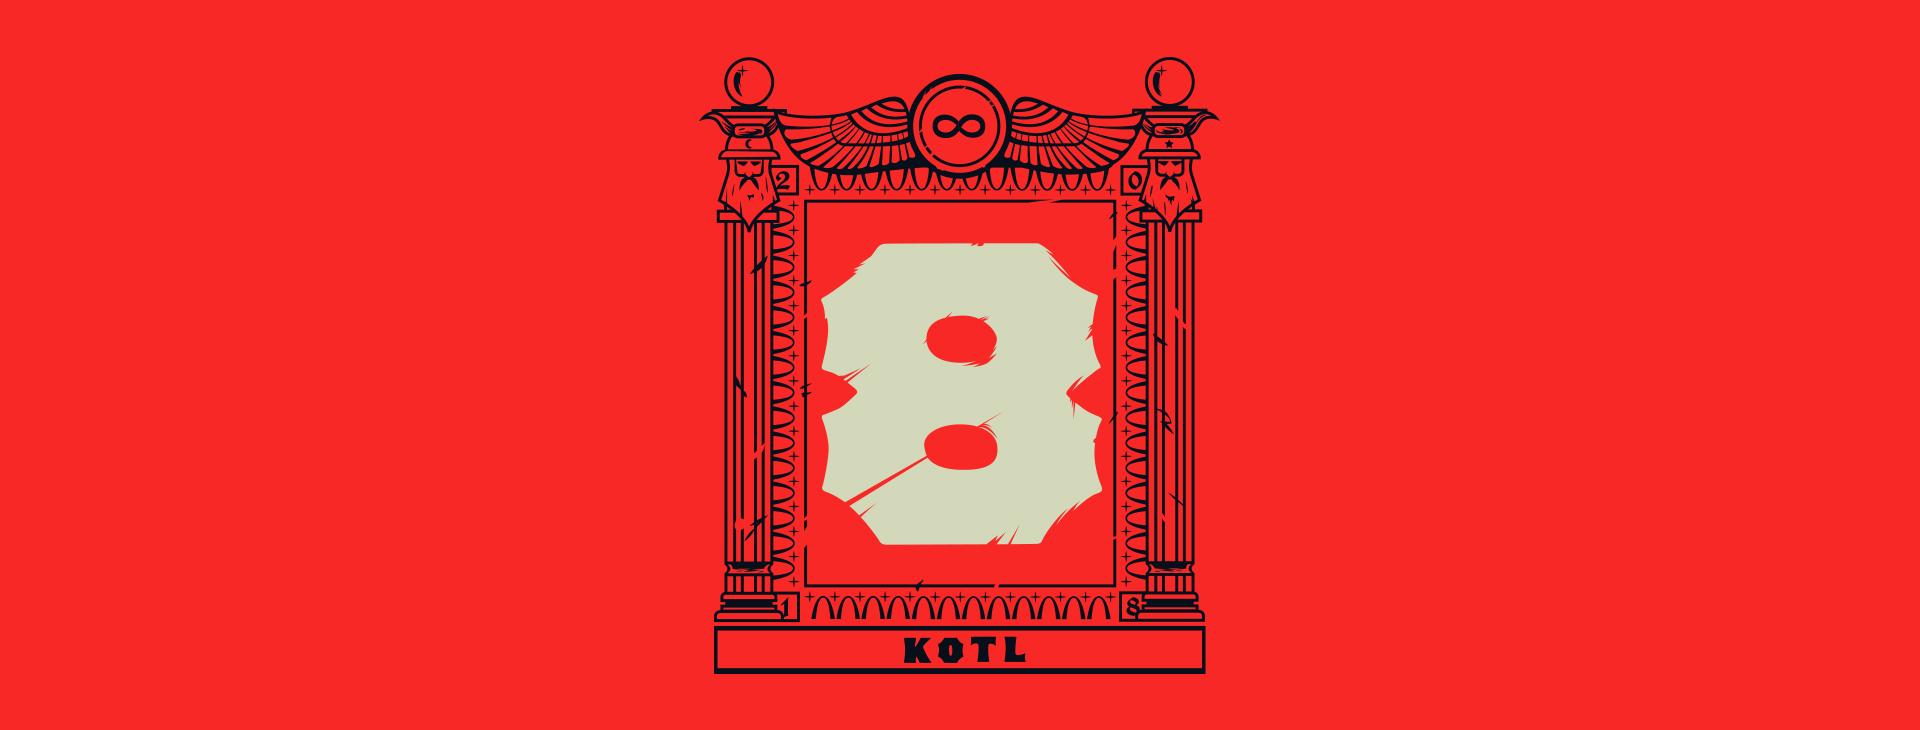 KOTL8_Facebook_Cover_Photo_Template.jpg